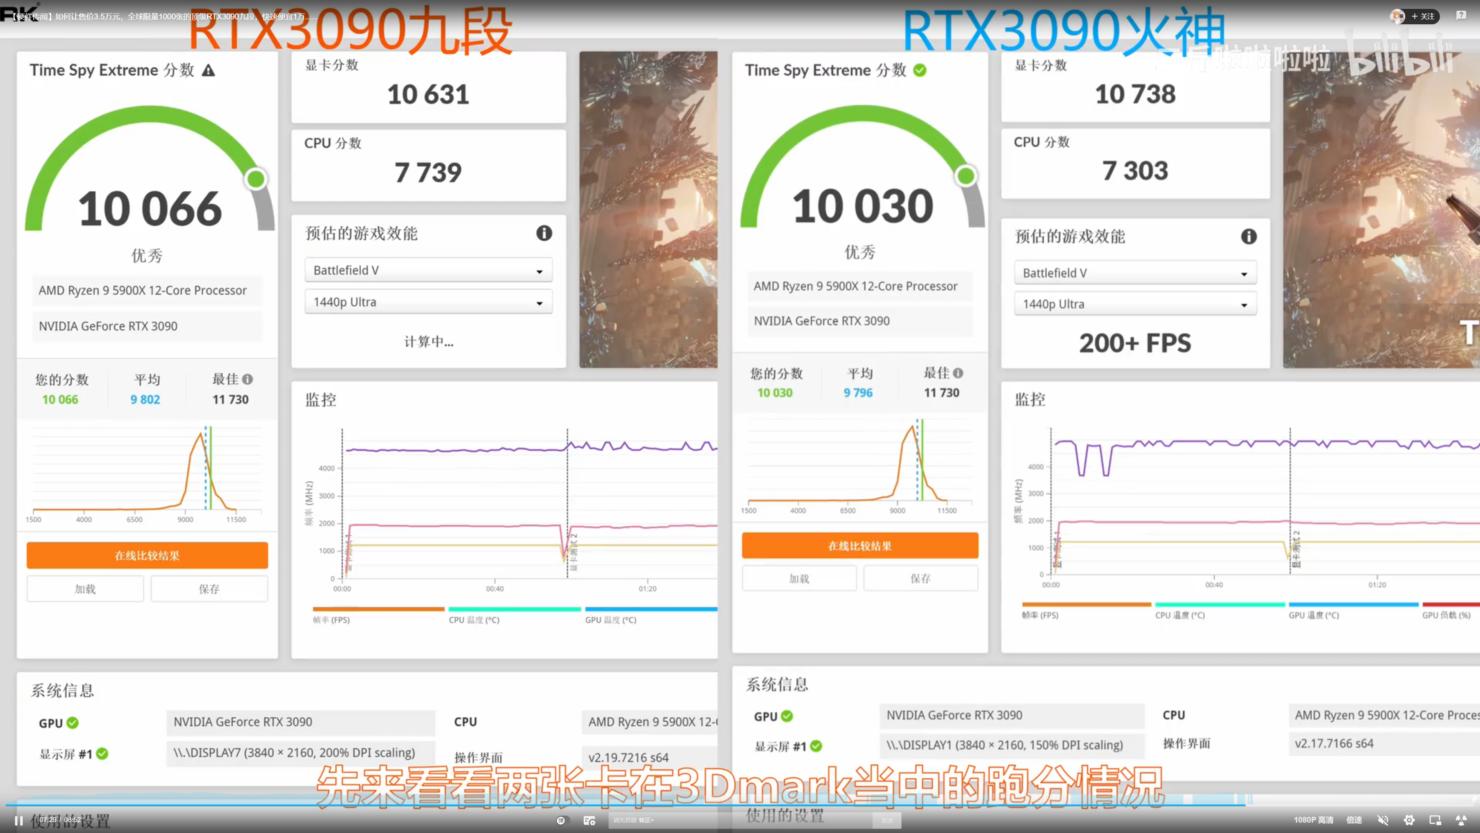 colorful-igame-geforce-rtx-3090-kudan-graphics-card-benchmarks-_1